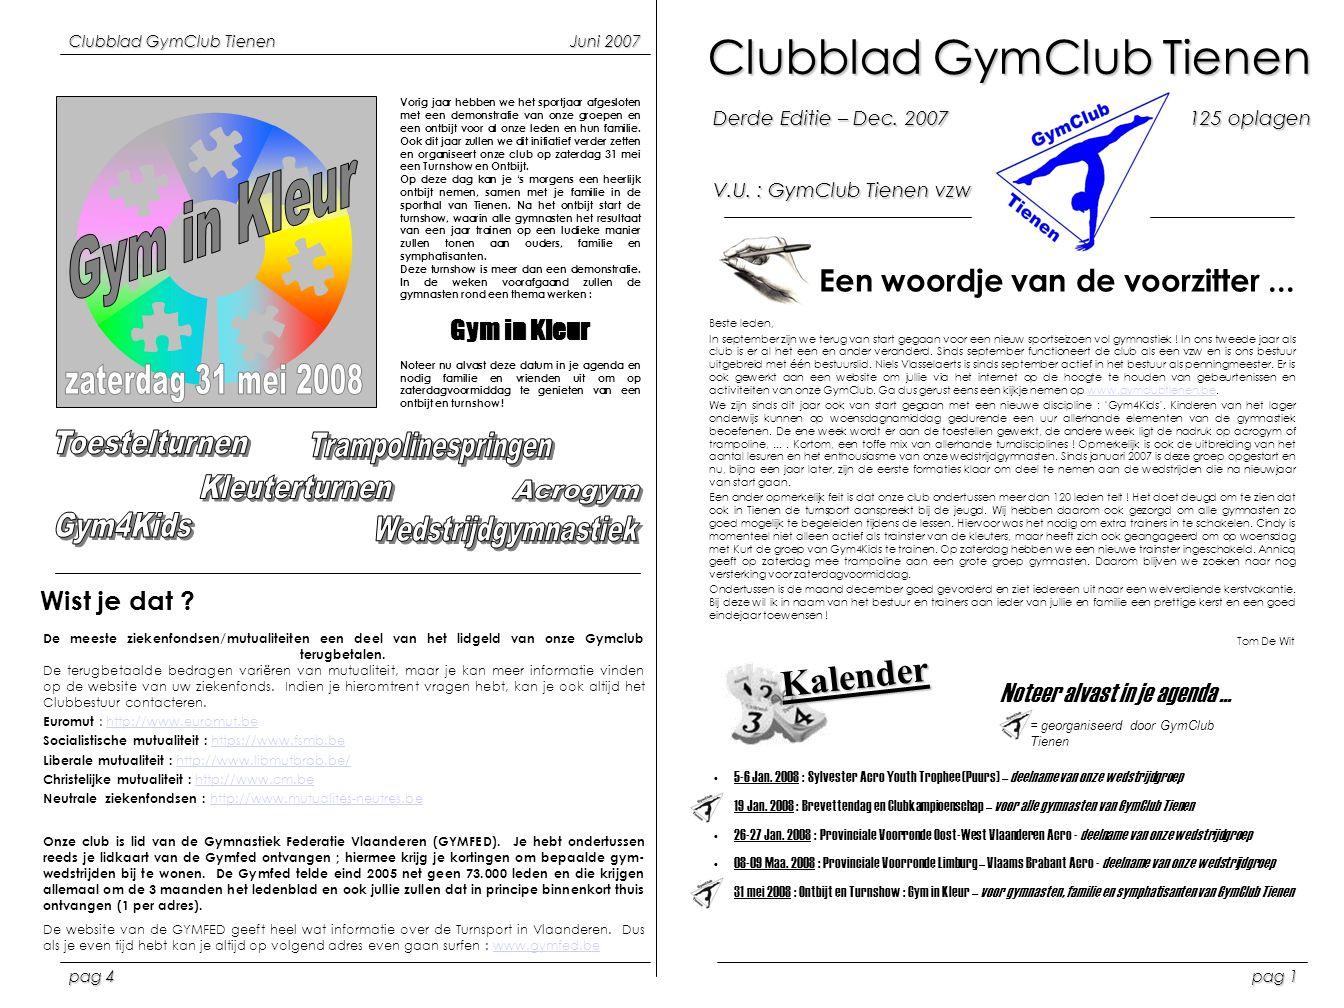 Clubblad GymClub TienenJuni 2007 pag 3 pag 2 Wie zijn onze leden .